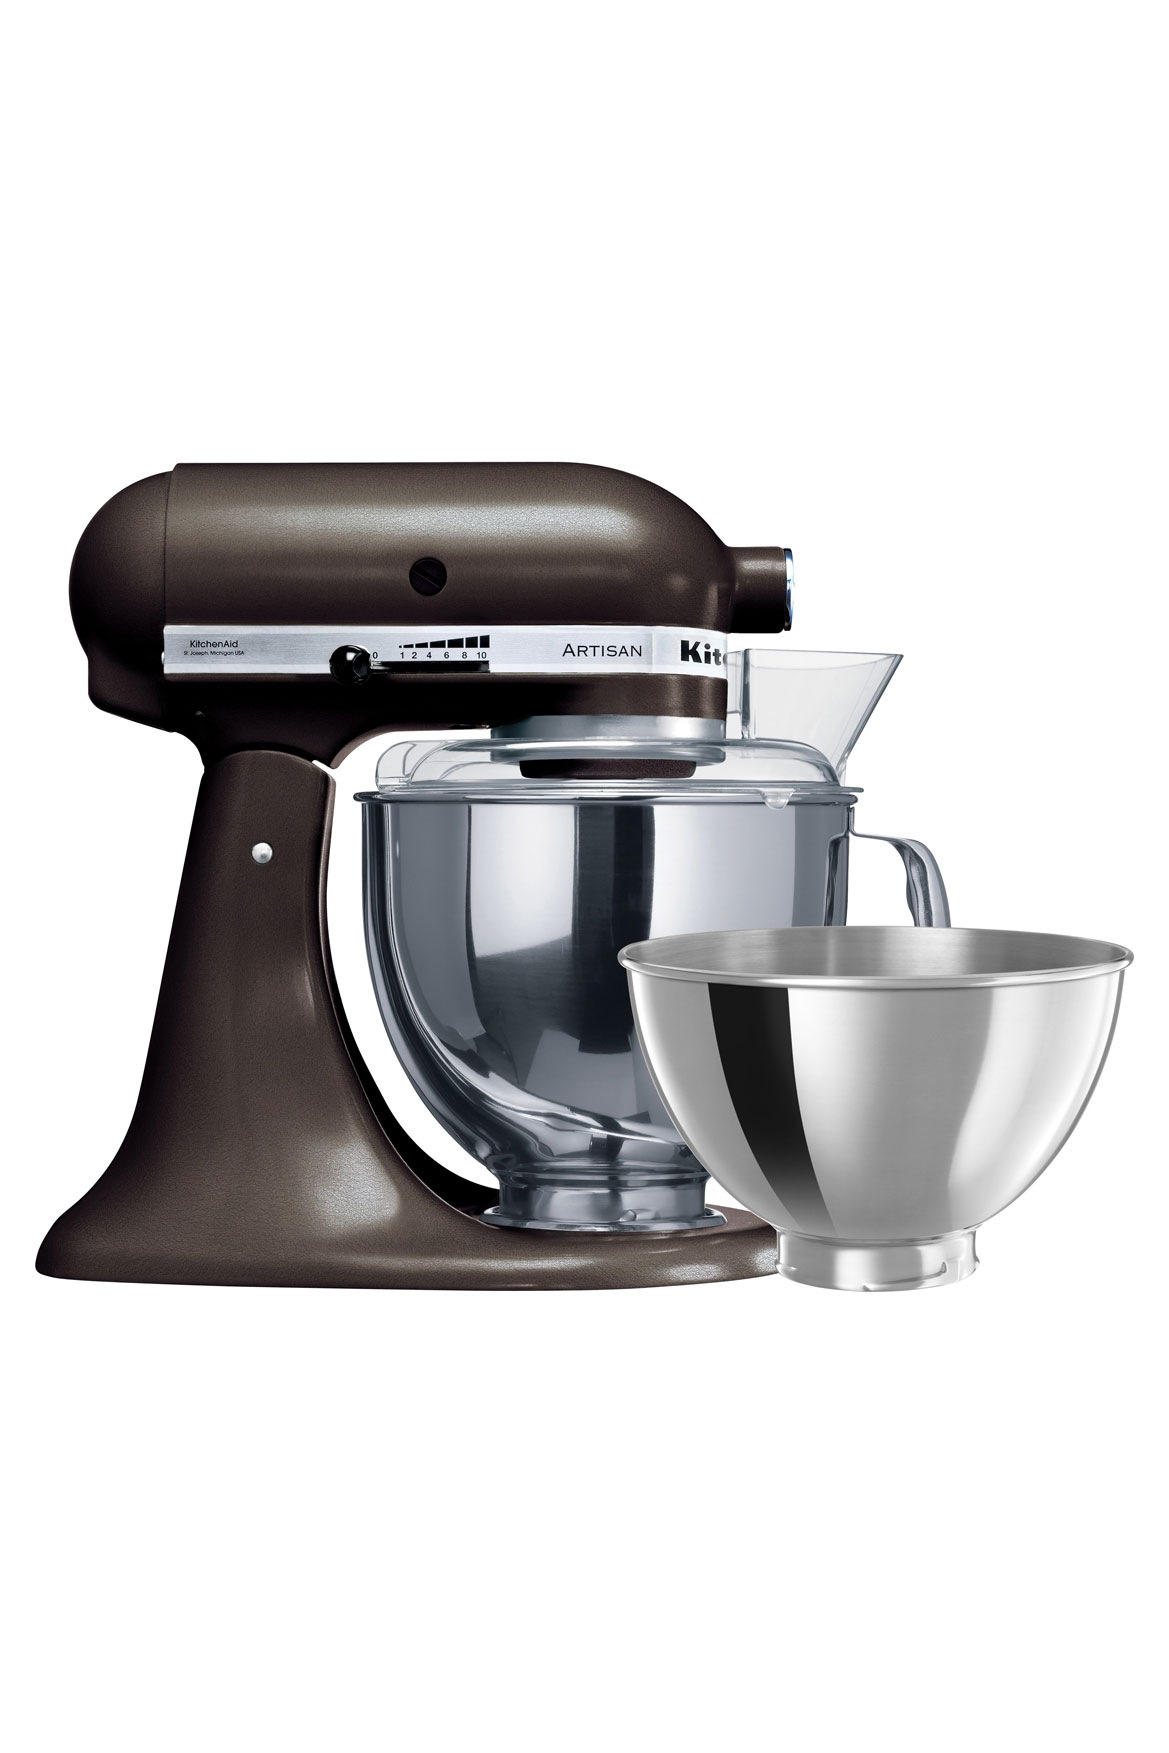 Uncategorized Myer Kitchen Appliances kitchenaid ksm160 artisan mixer truffle 5ksm160psatd myer online